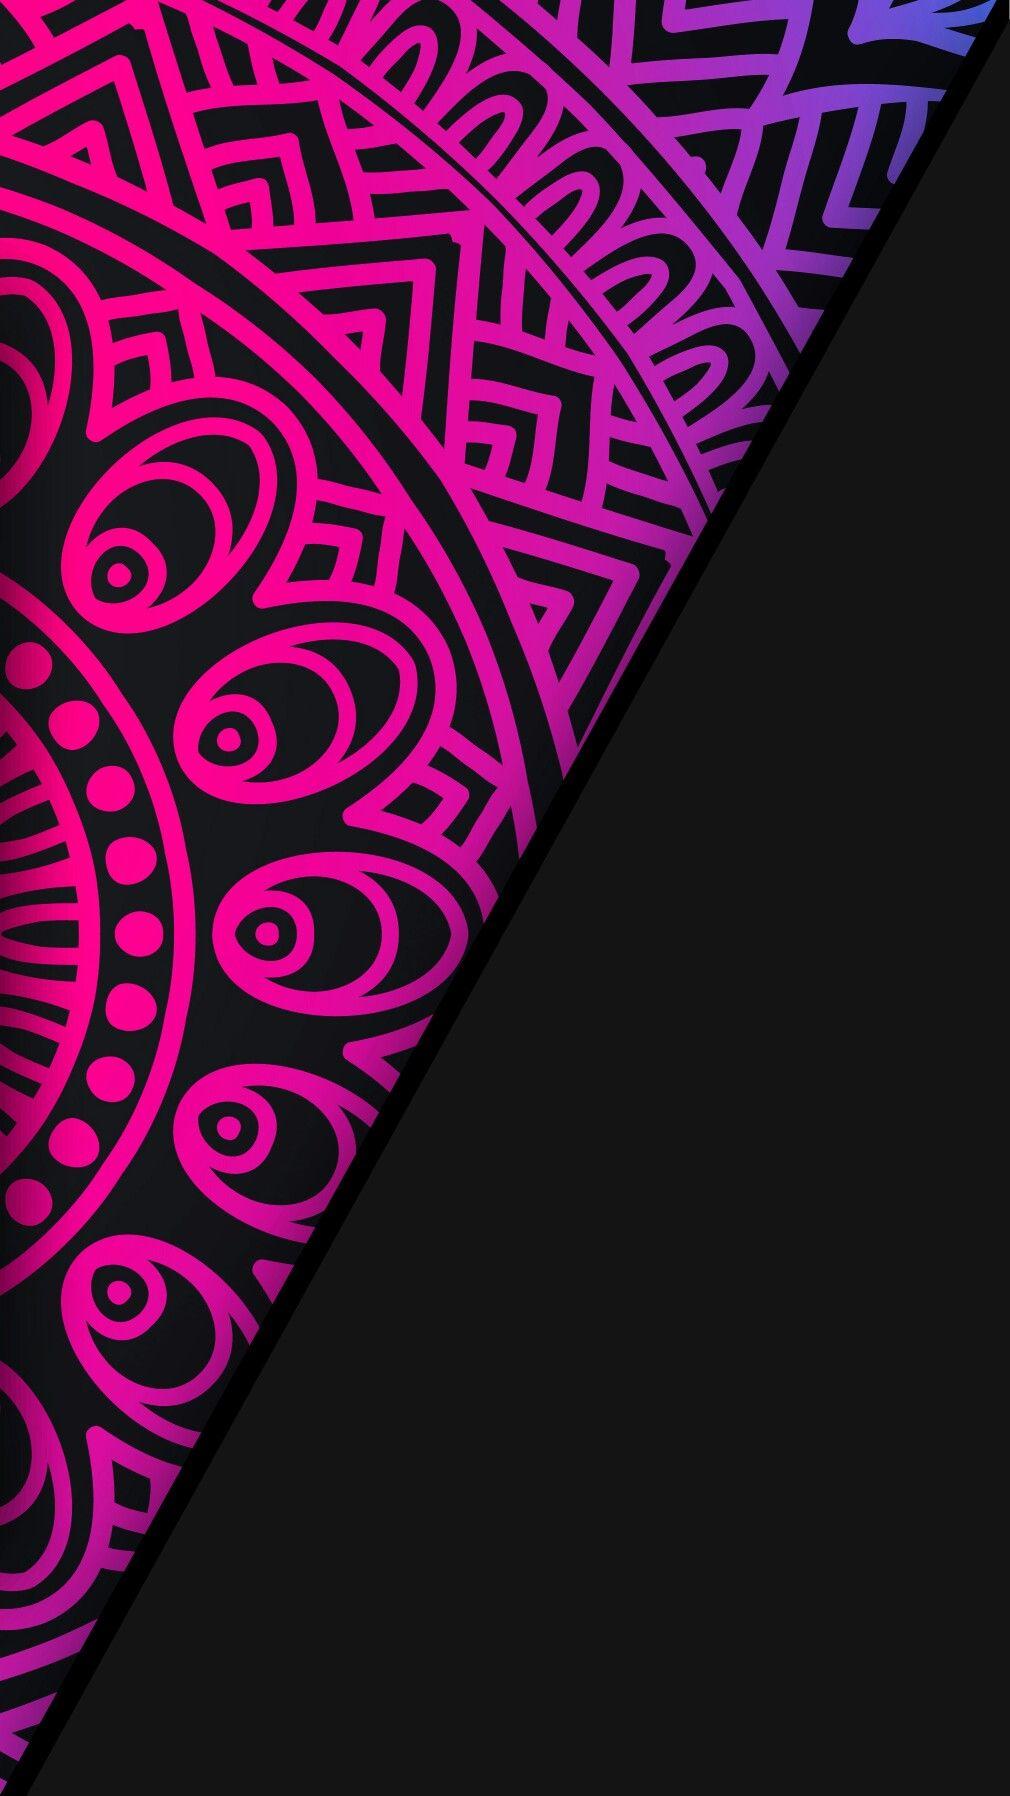 Black and pink cool en pinterest wallpaper iphone